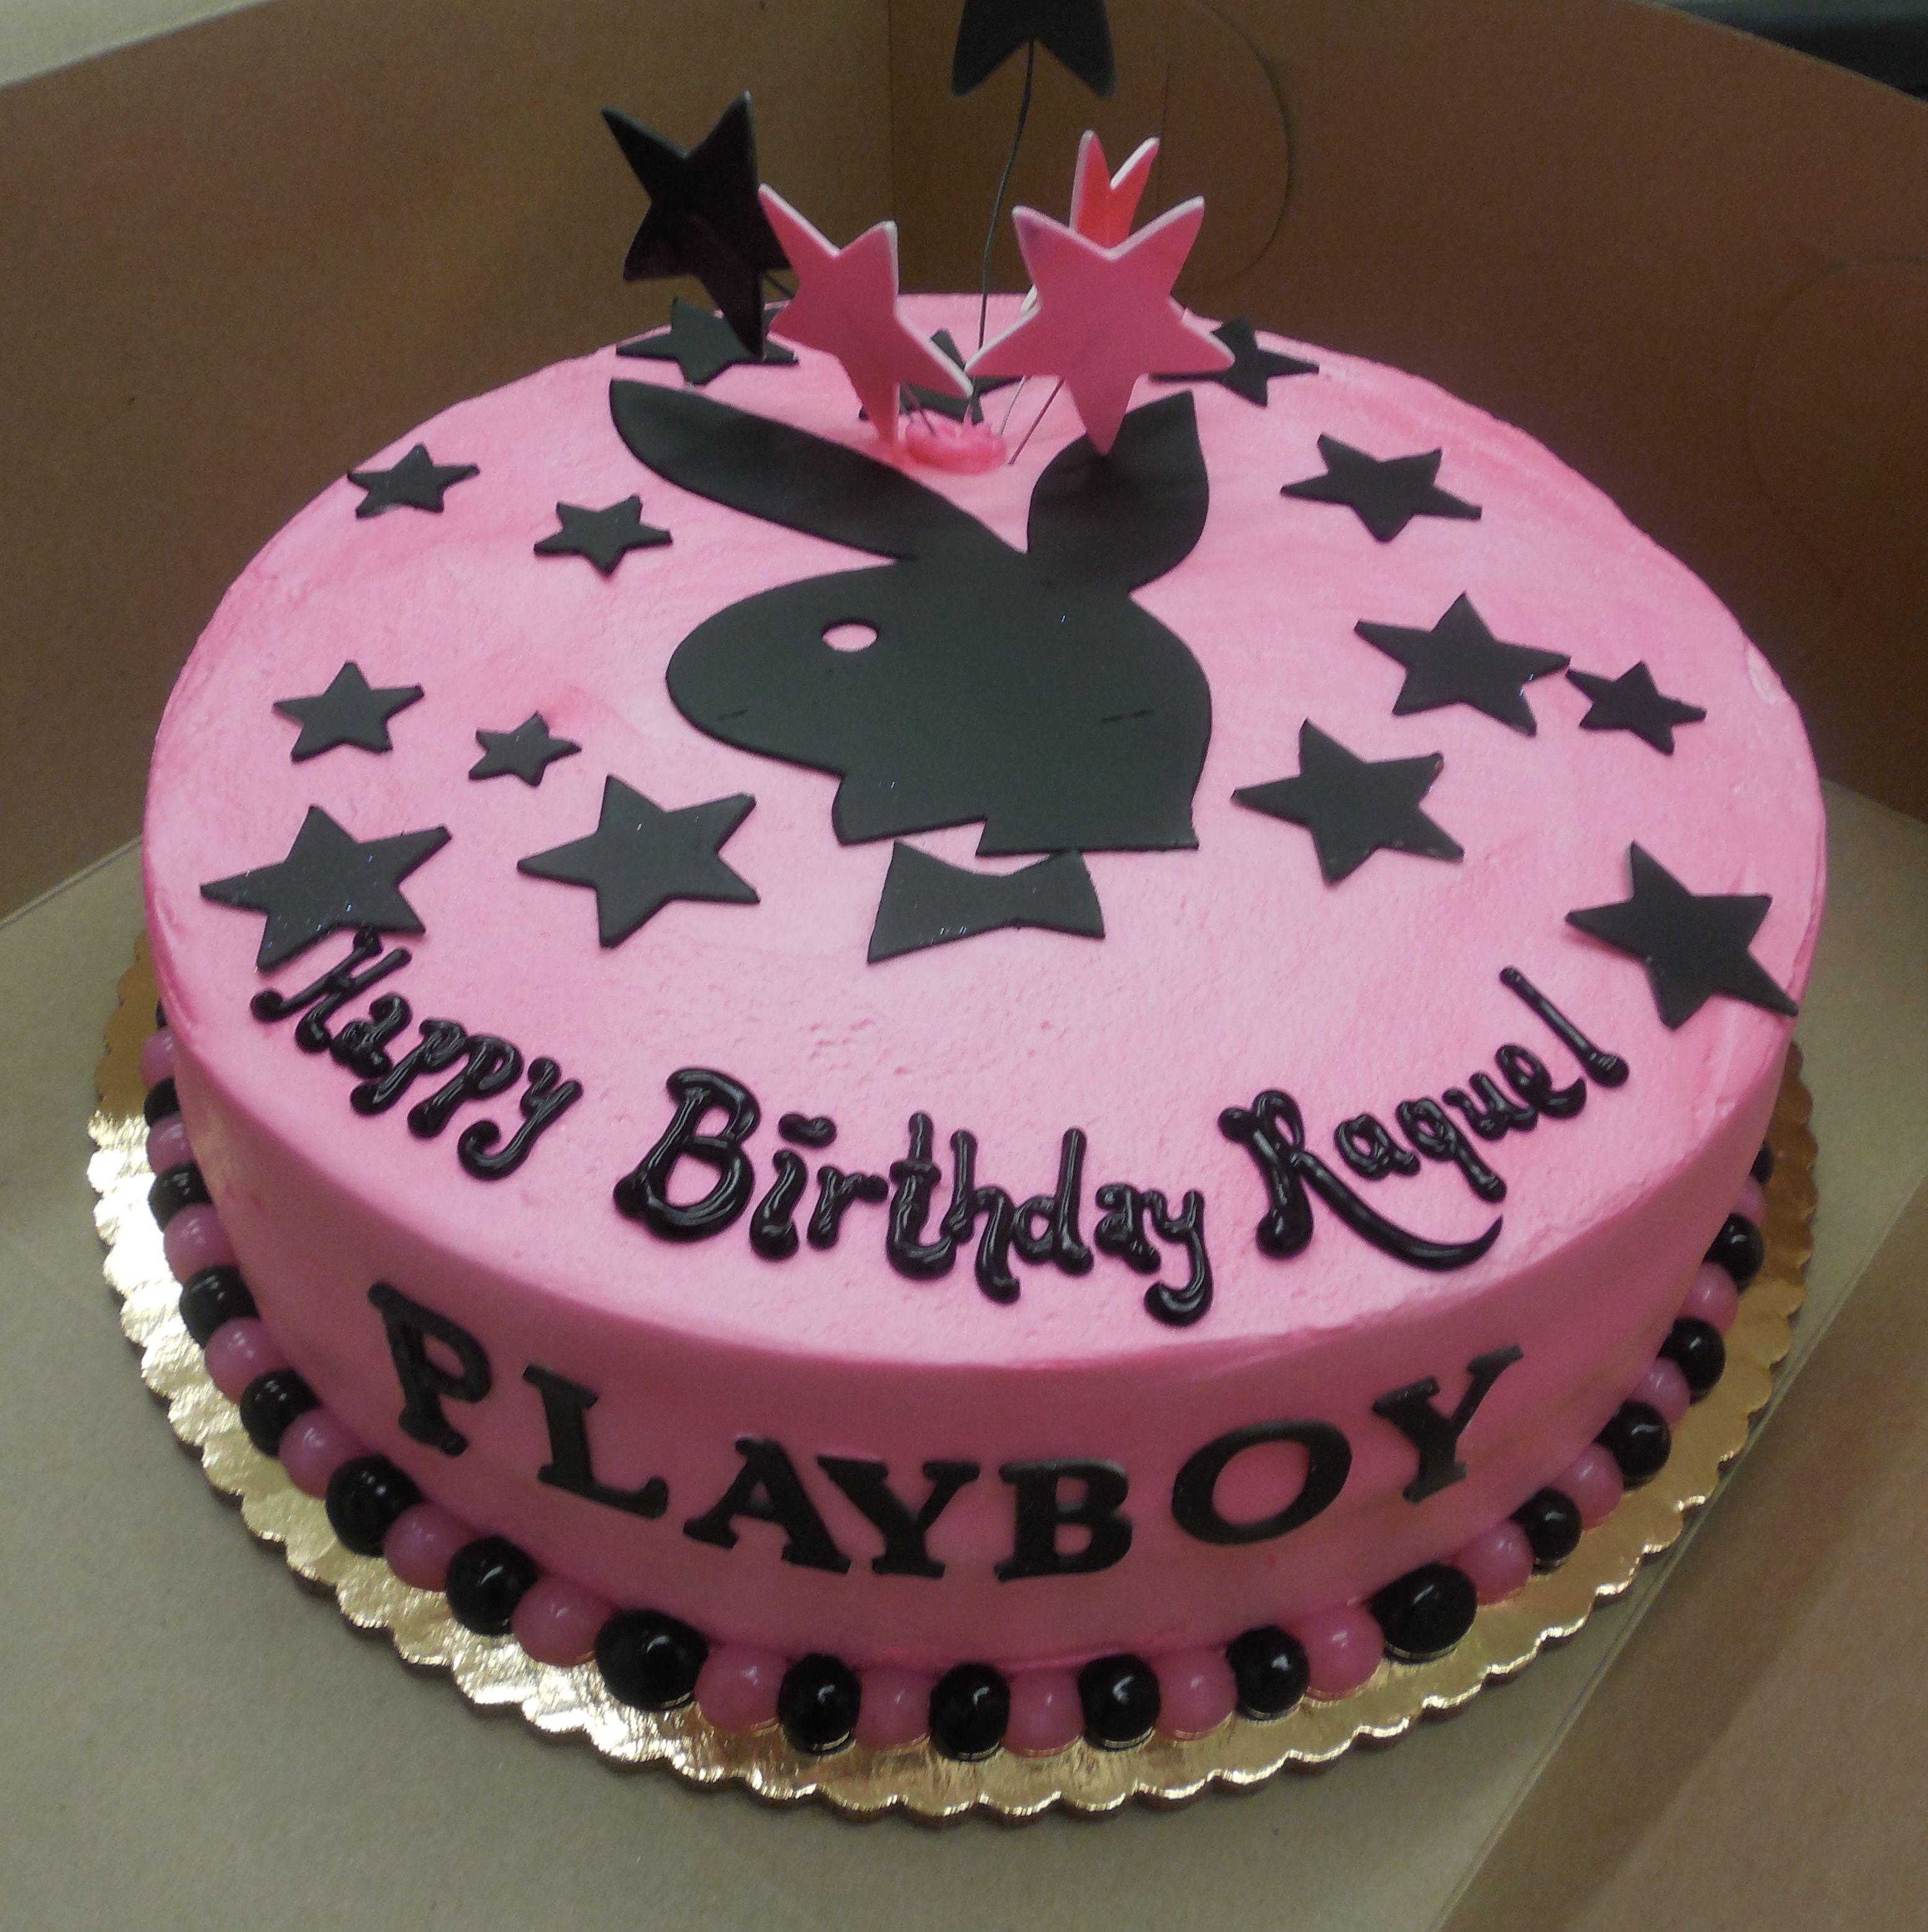 playboy bunny cakes